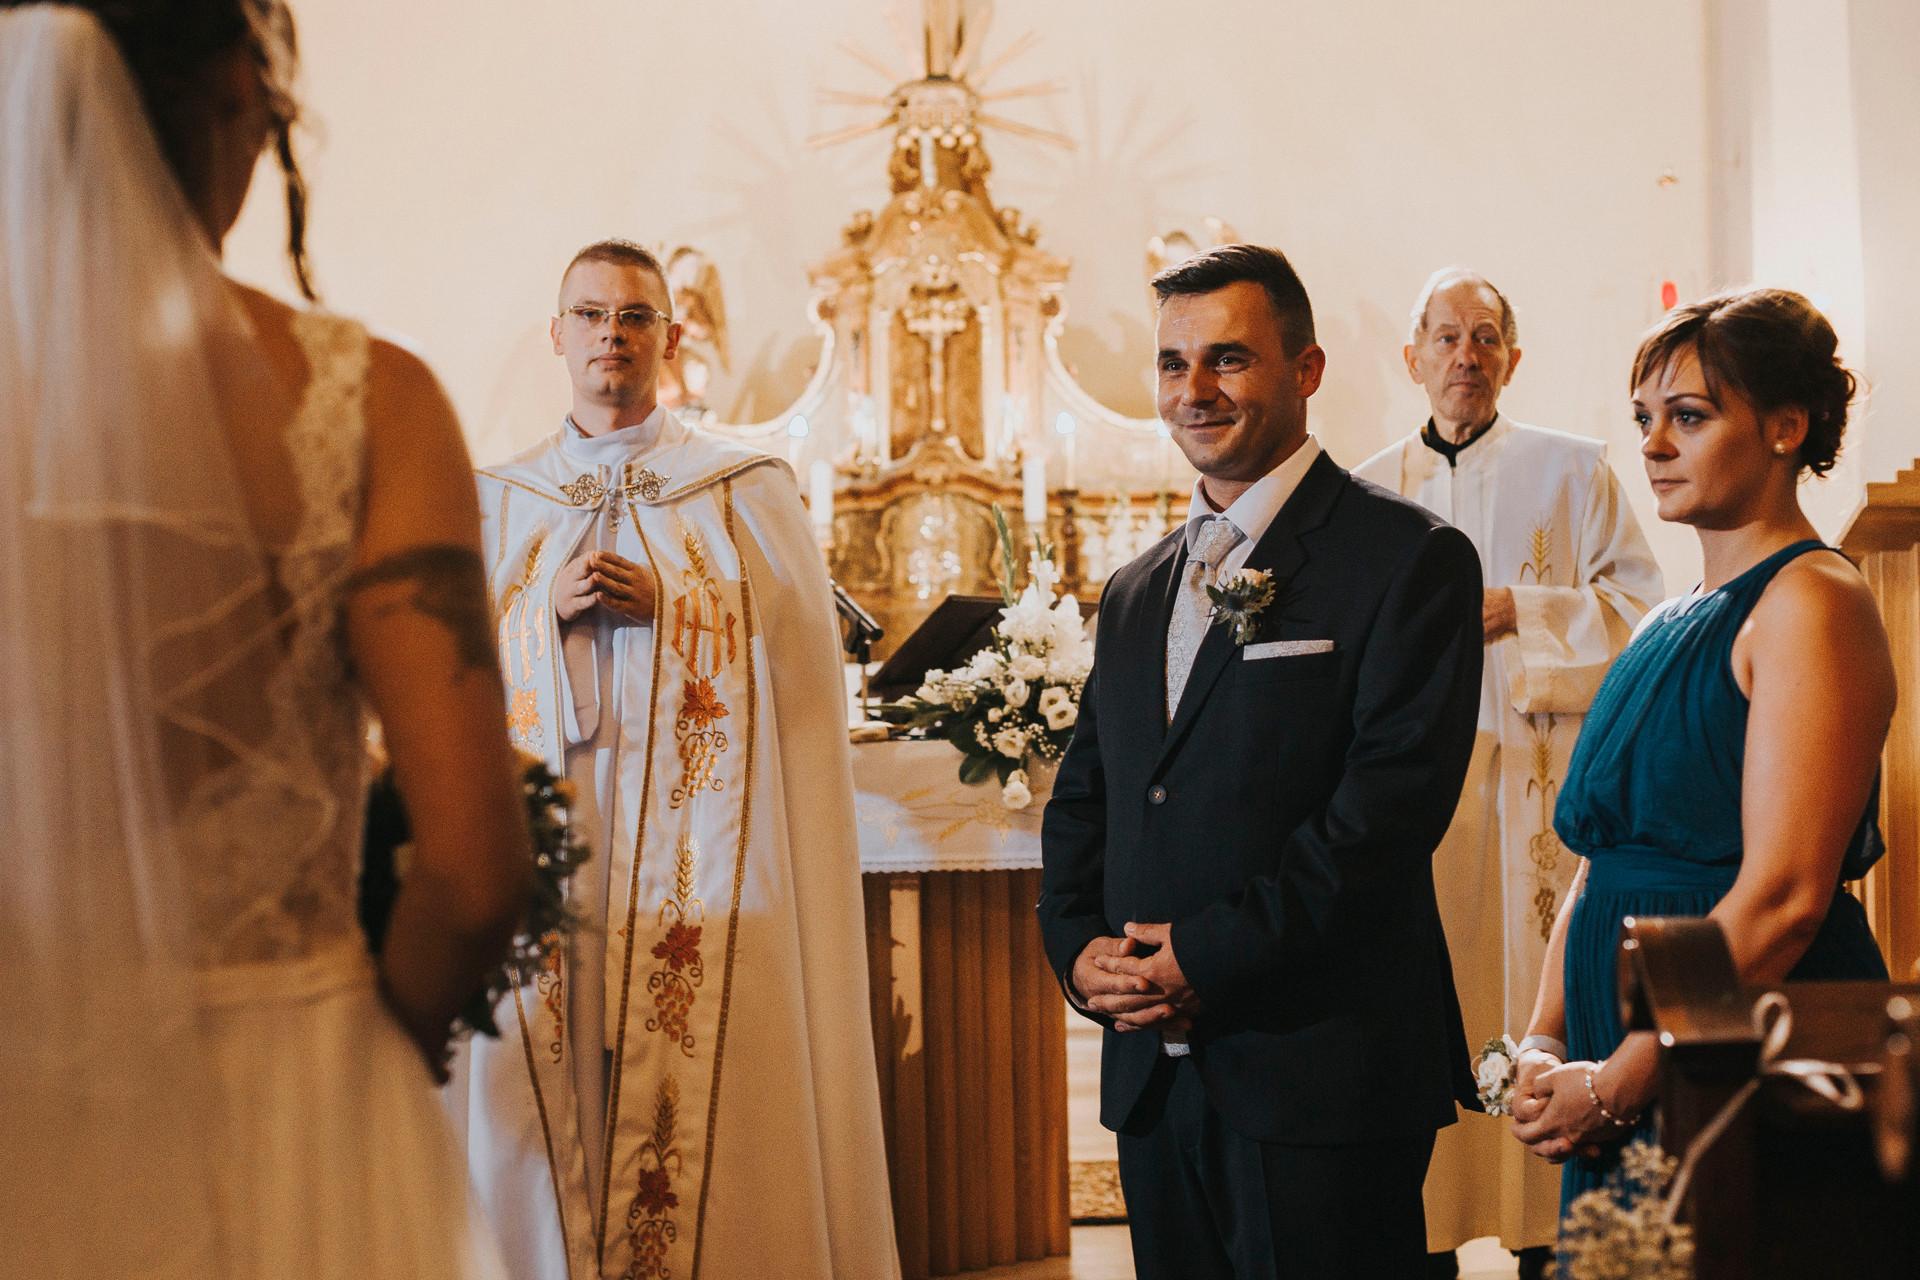 Hungary wedding 21.JPG